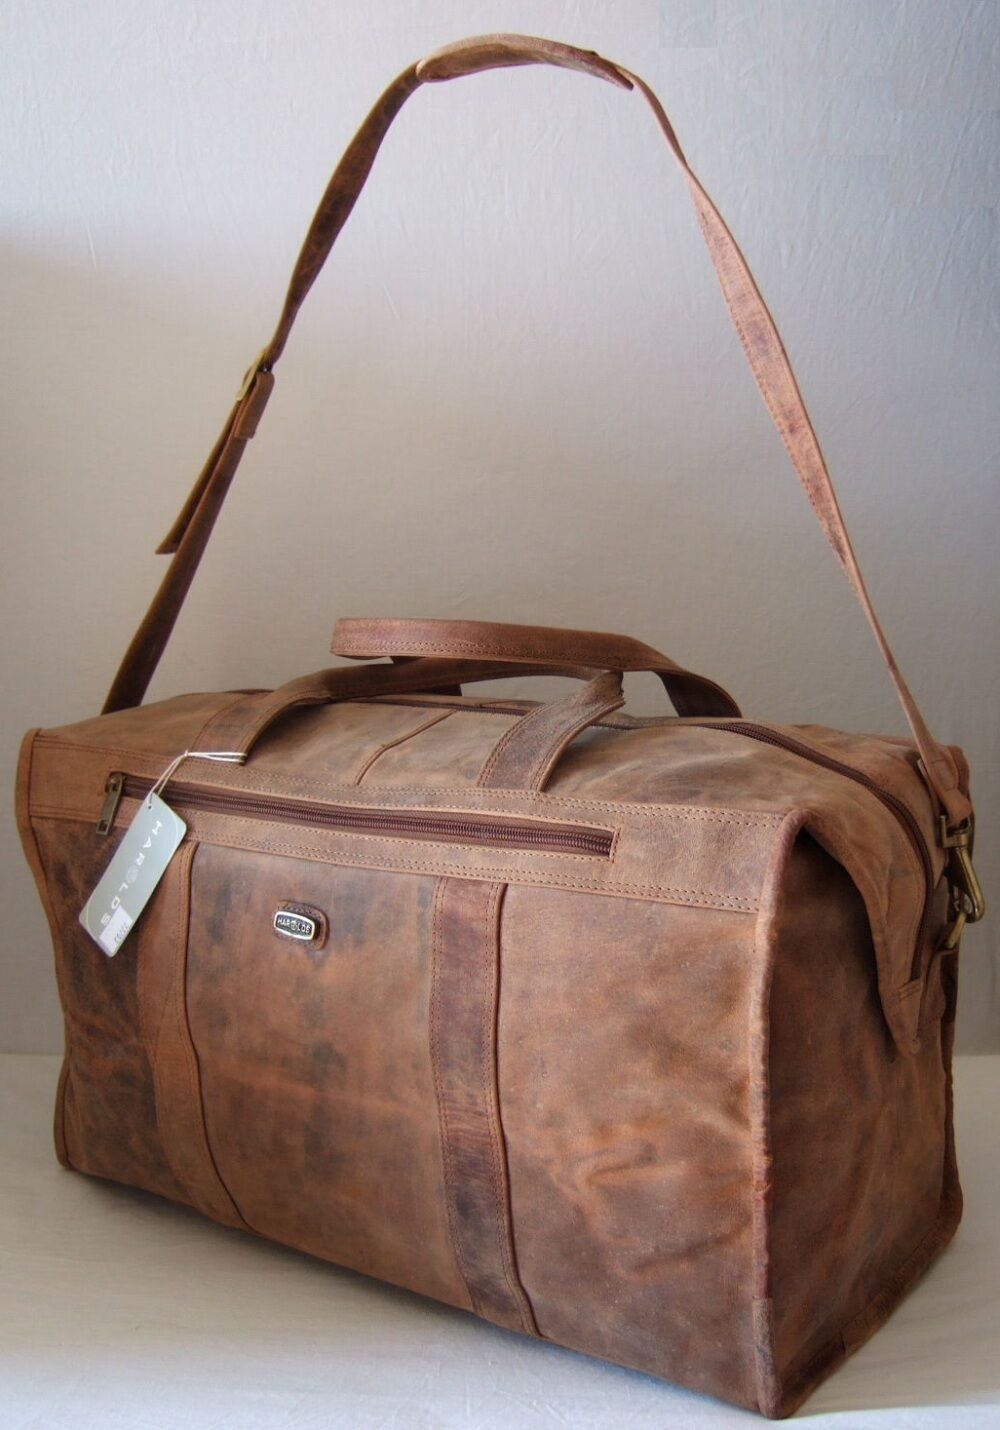 Harold's Reisetasche 503026 cm Rind-Leder Sport-Tasche Weekender Harolds 77703